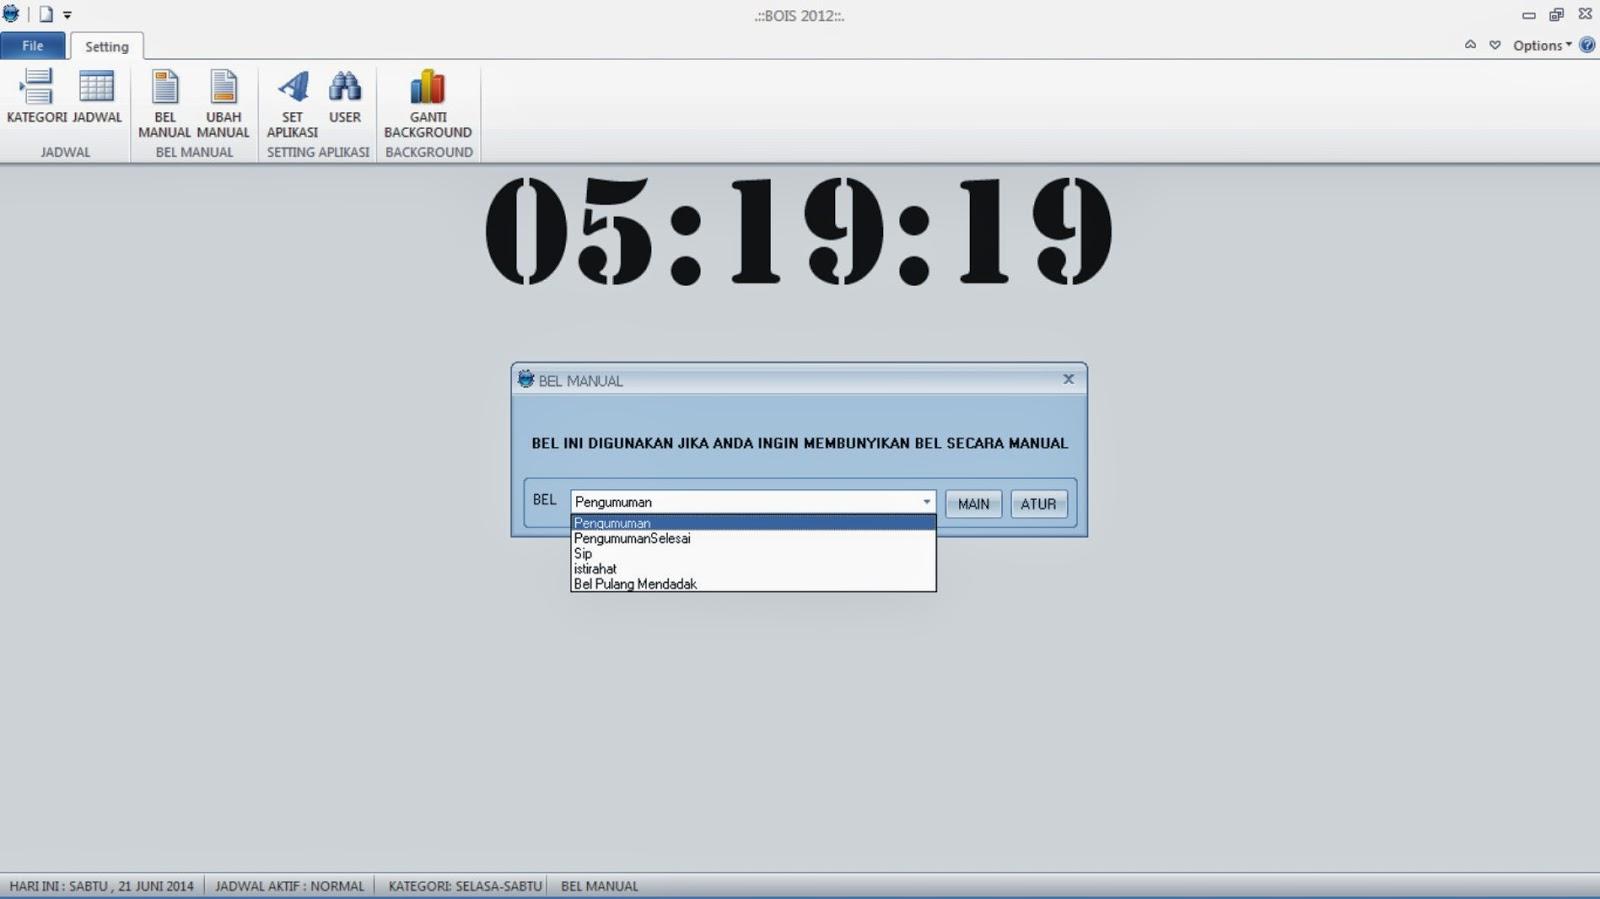 BEL OTOMATIS (BOIS 2012) ~ Agen Software Madiun